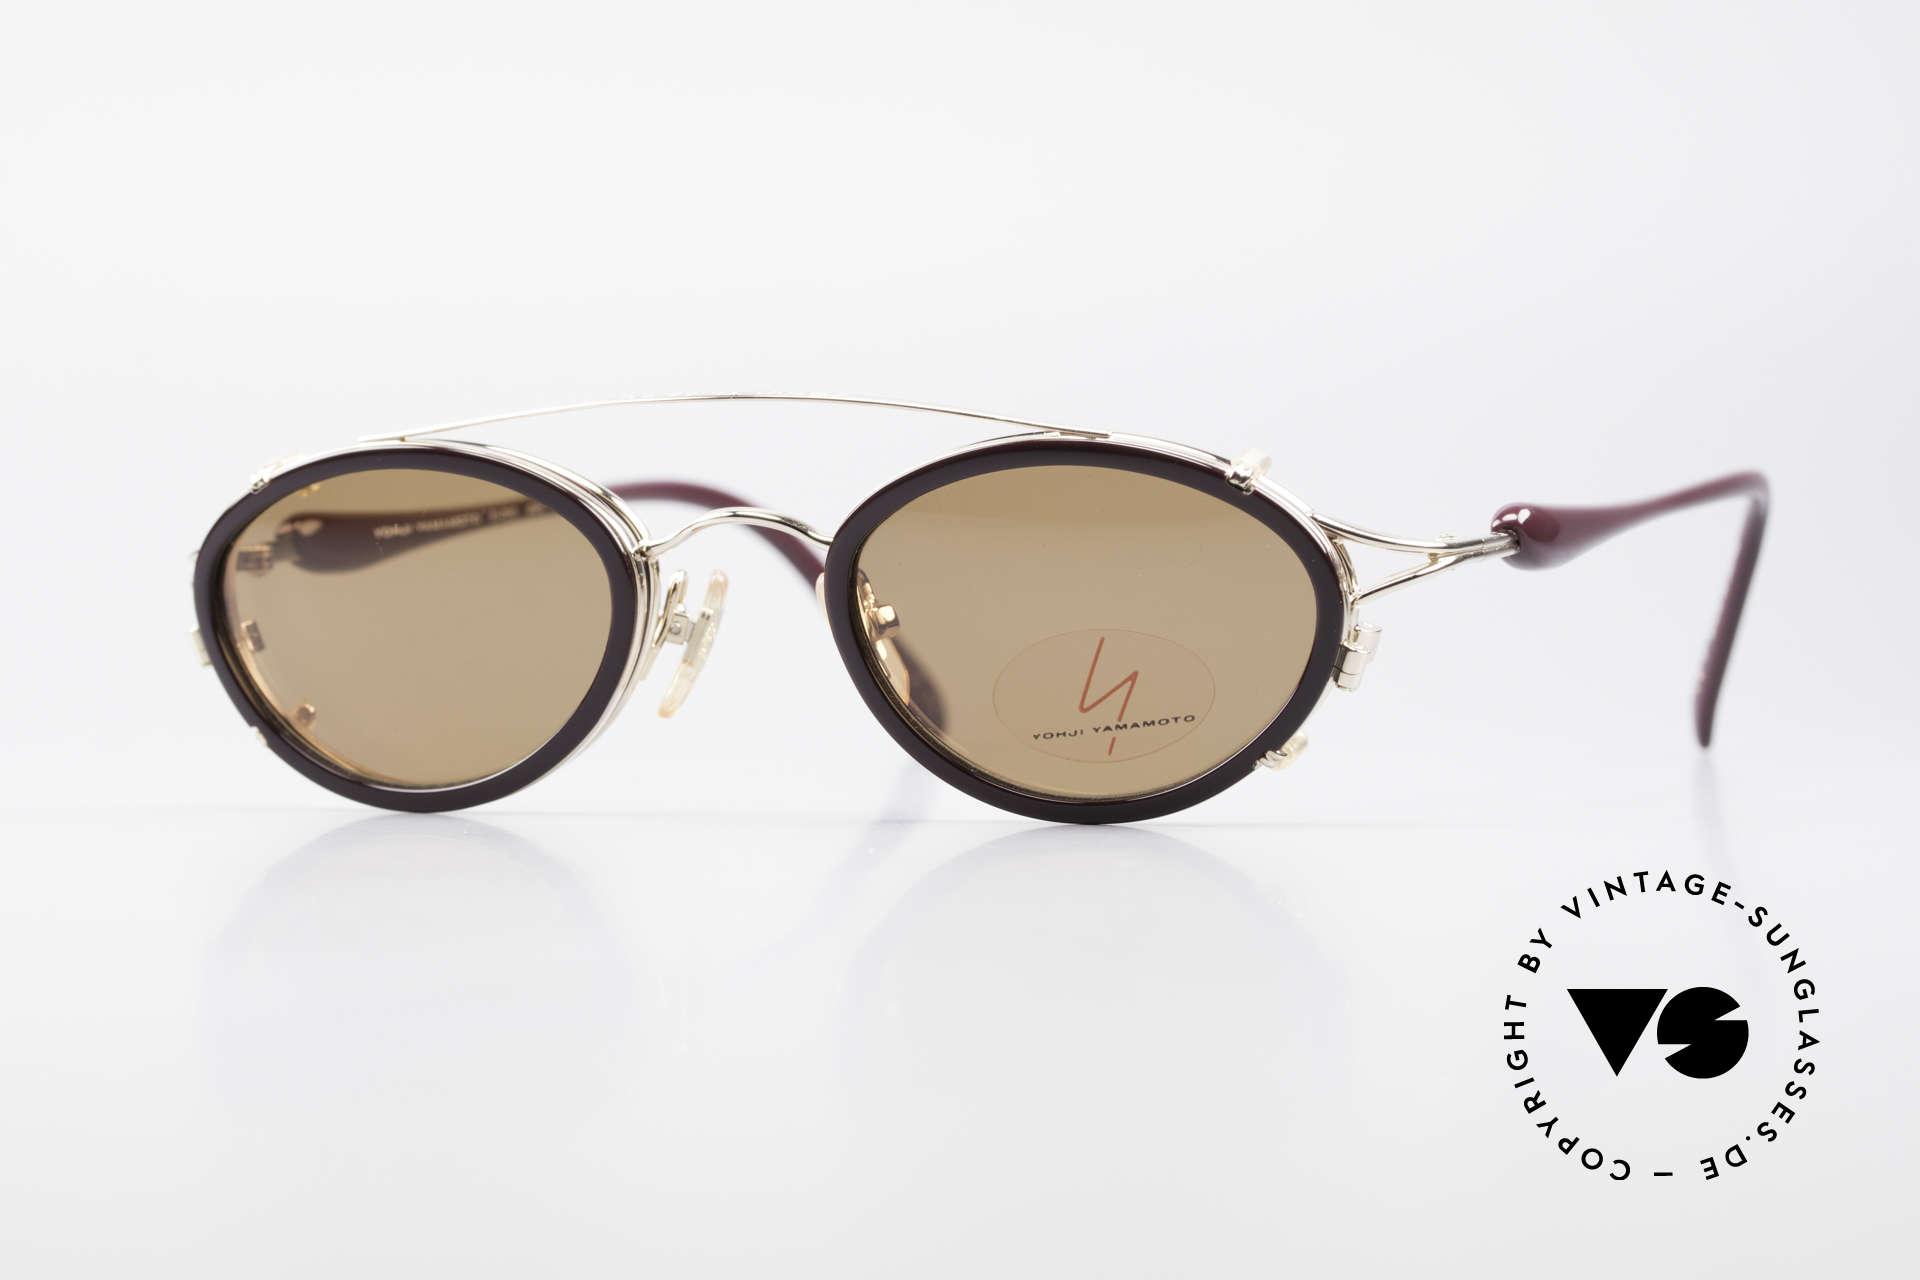 Yohji Yamamoto 51-7210 Clip-On 90's No Retro Frame, vintage 1990's sunglasses by Yohji Yamamoto, Japan, Made for Men and Women